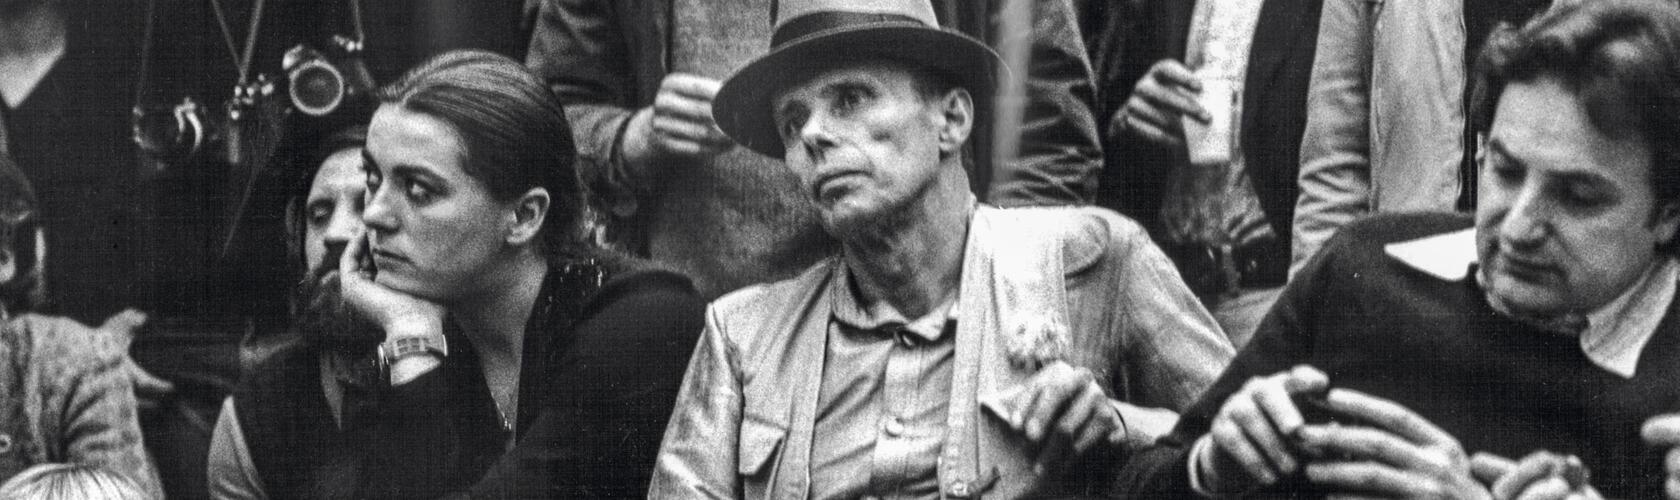 Writings by Katharina Sieverding about Joseph Beuys